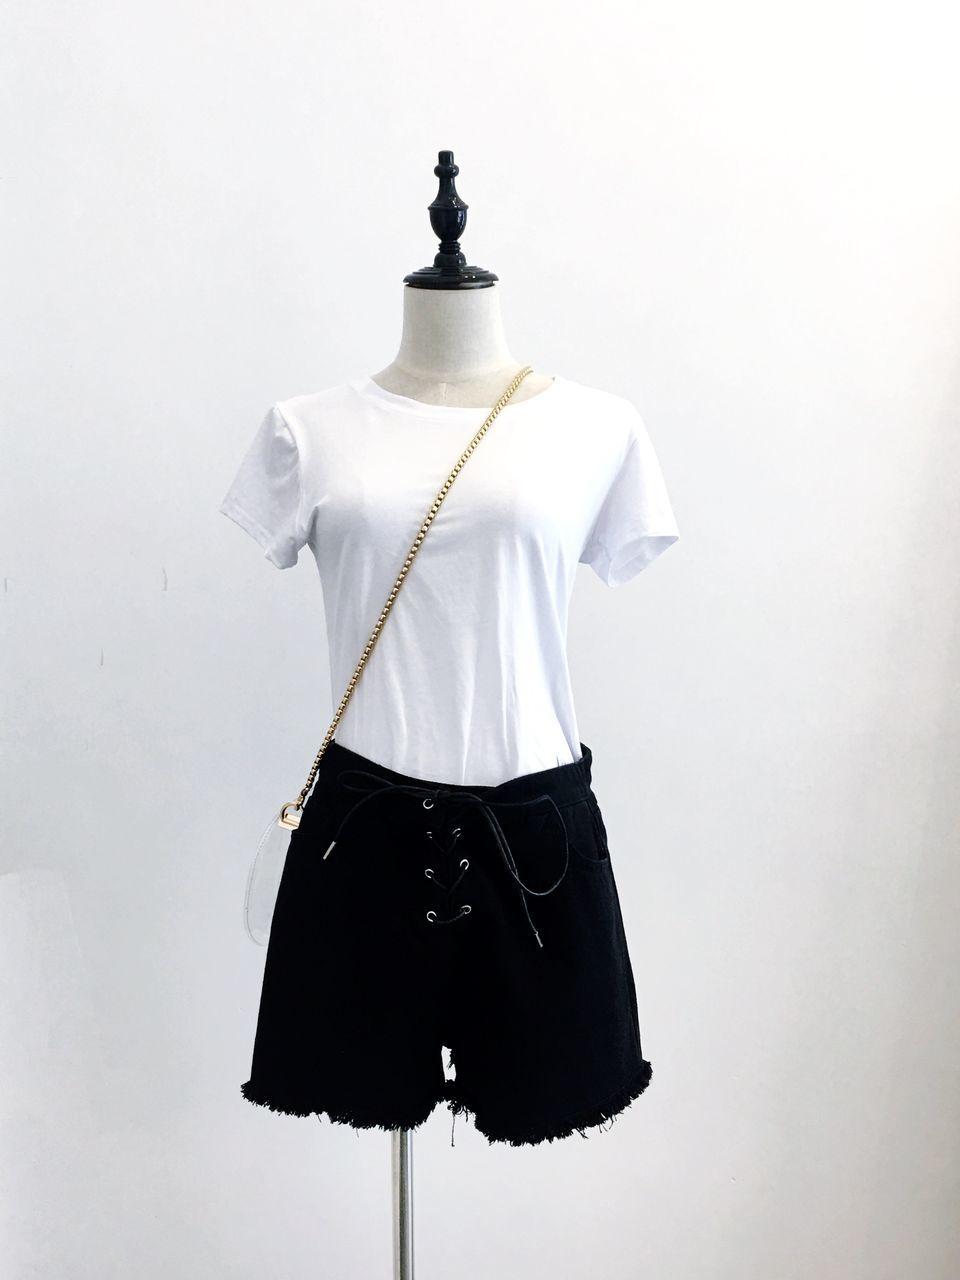 mannequin, fashion, t-shirt, studio shot, white background, no people, day